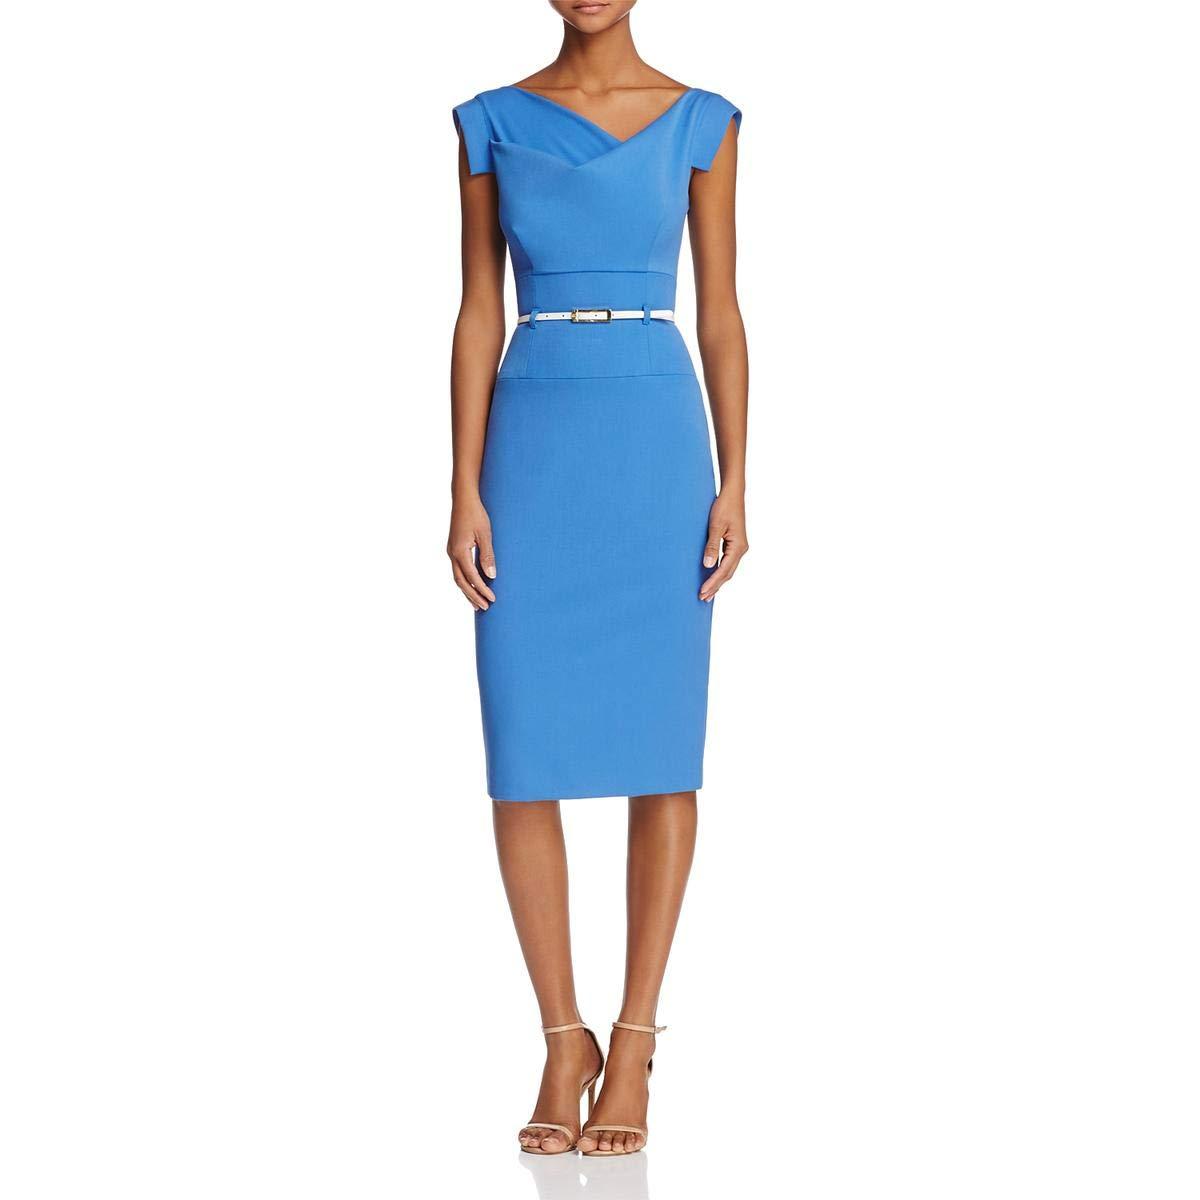 Available at Amazon: Black Halo Women's Jackie O Dress